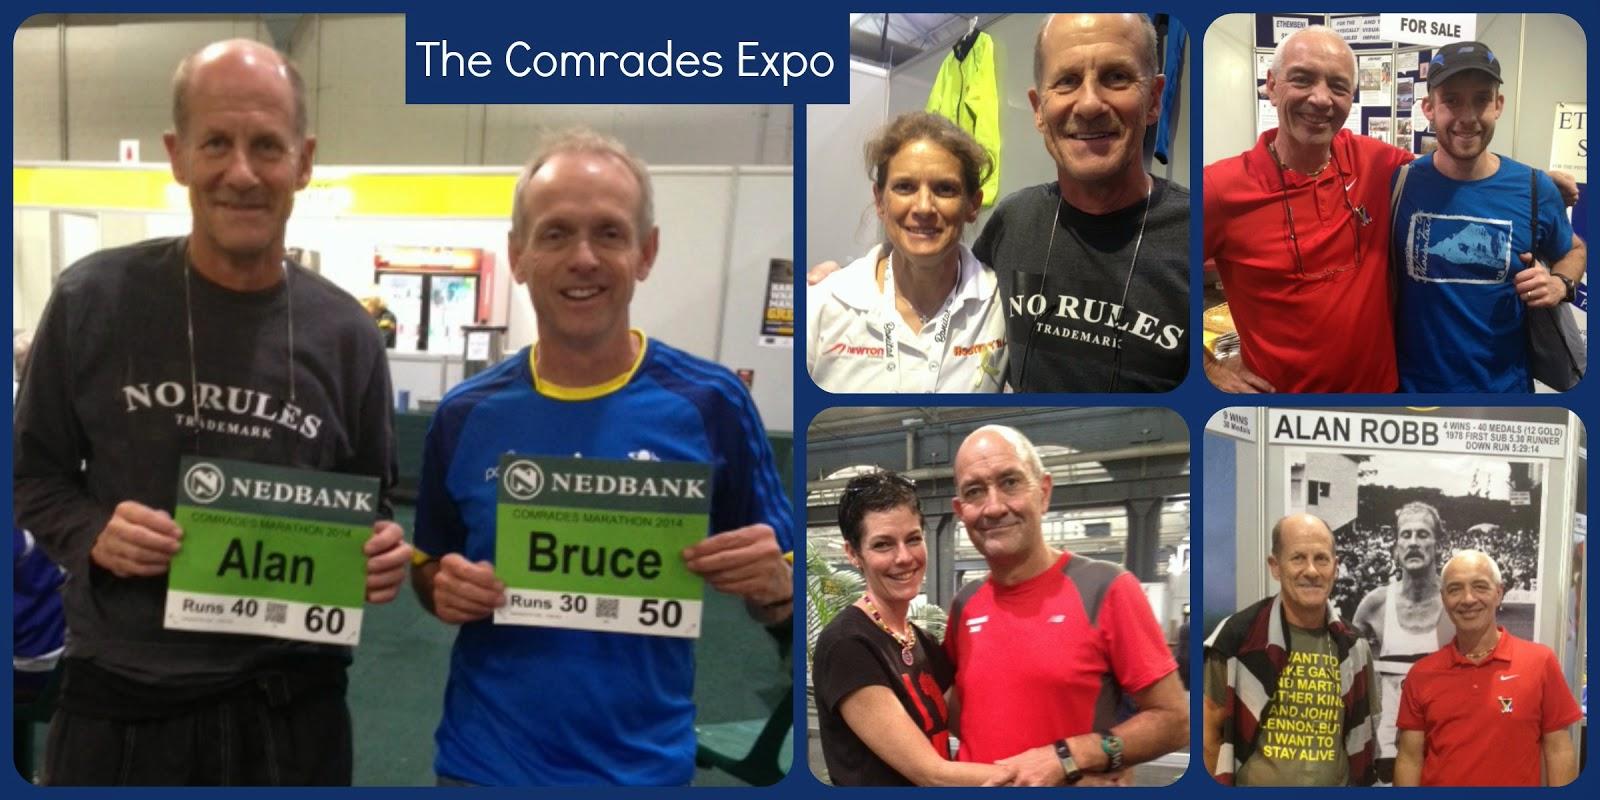 Comrades Marathon Expo 2014